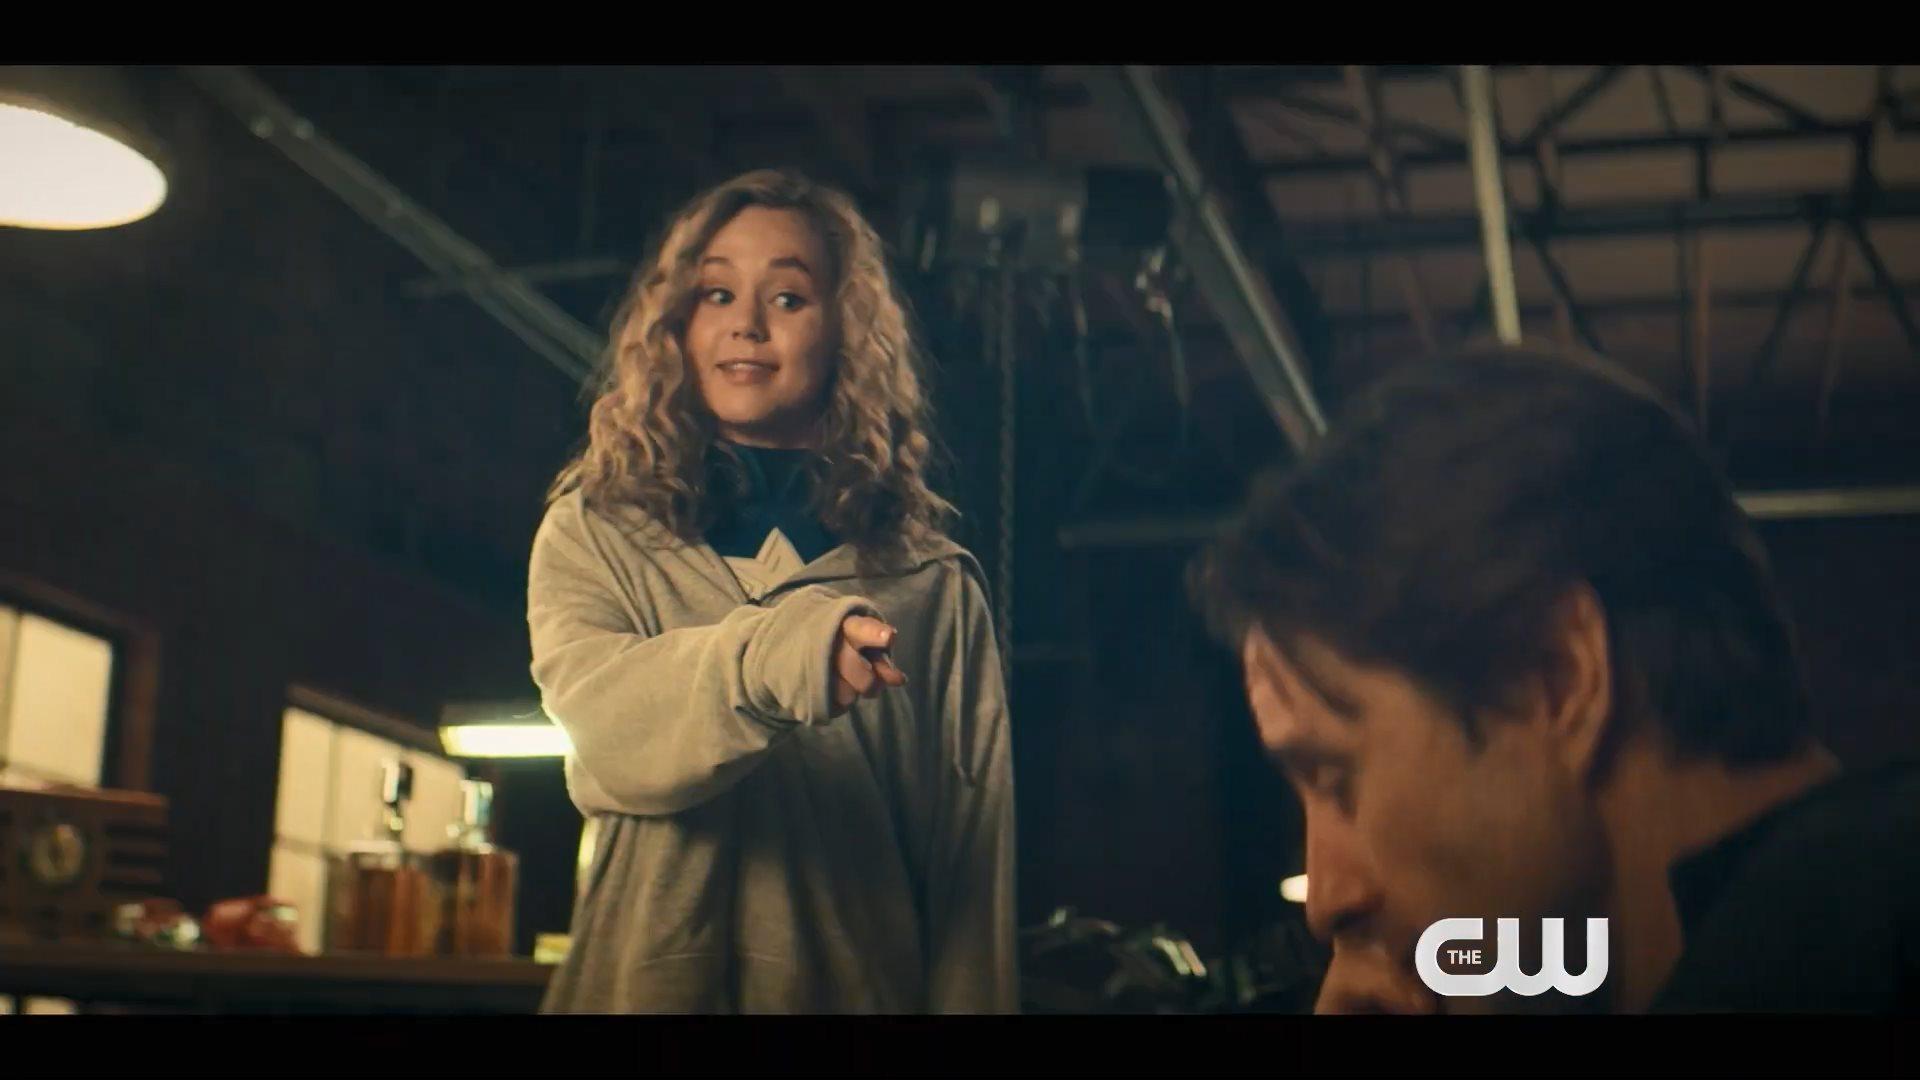 DC超英剧《逐星女》崭新预告 高中生少女挽救世界